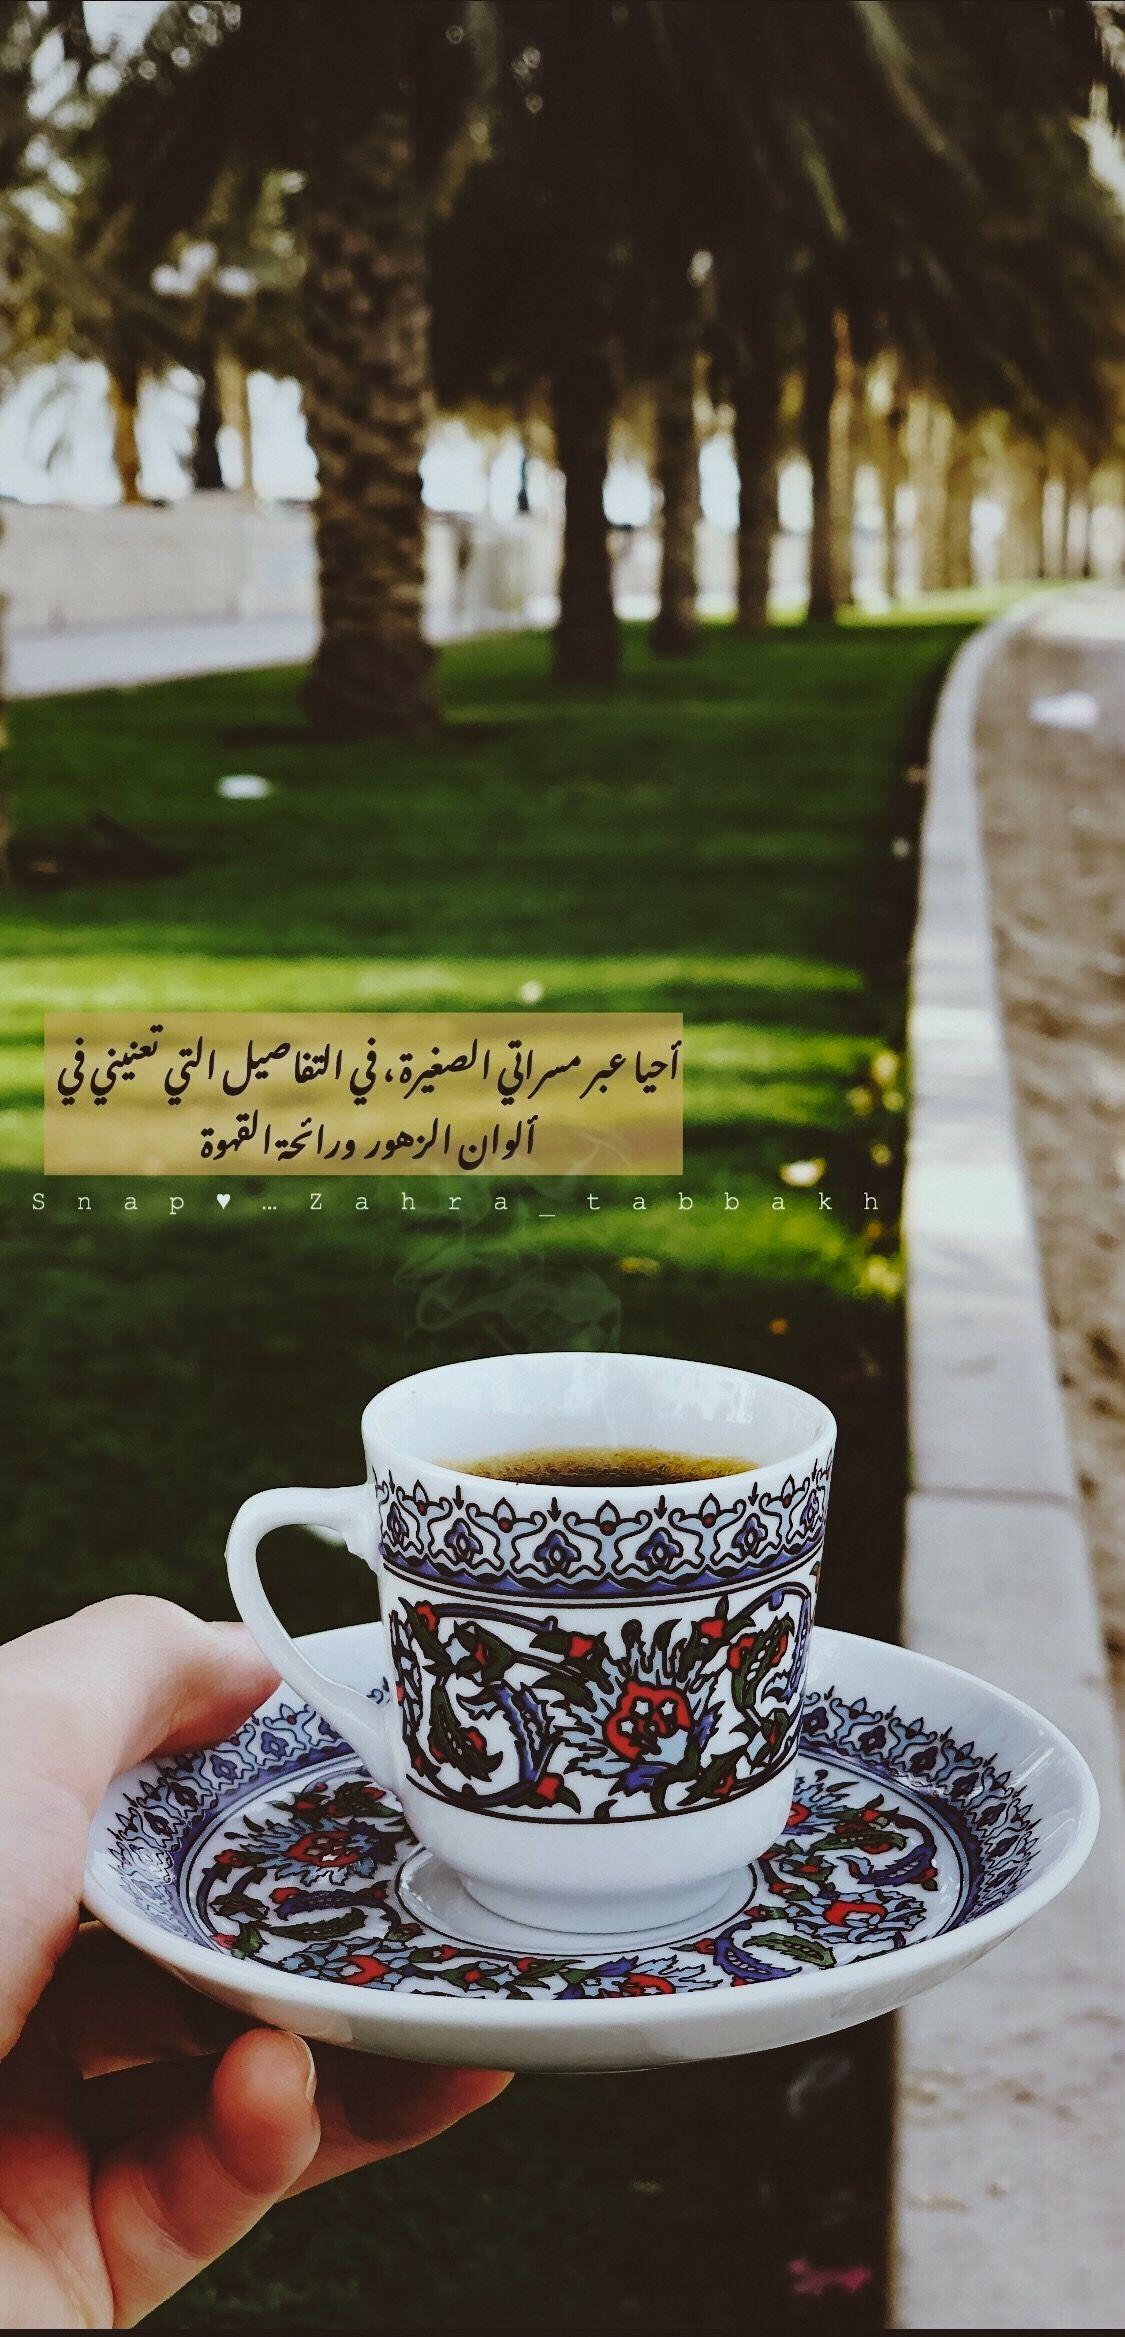 قهوة الصباح Arabic Quotes Coffee Tea Coffee